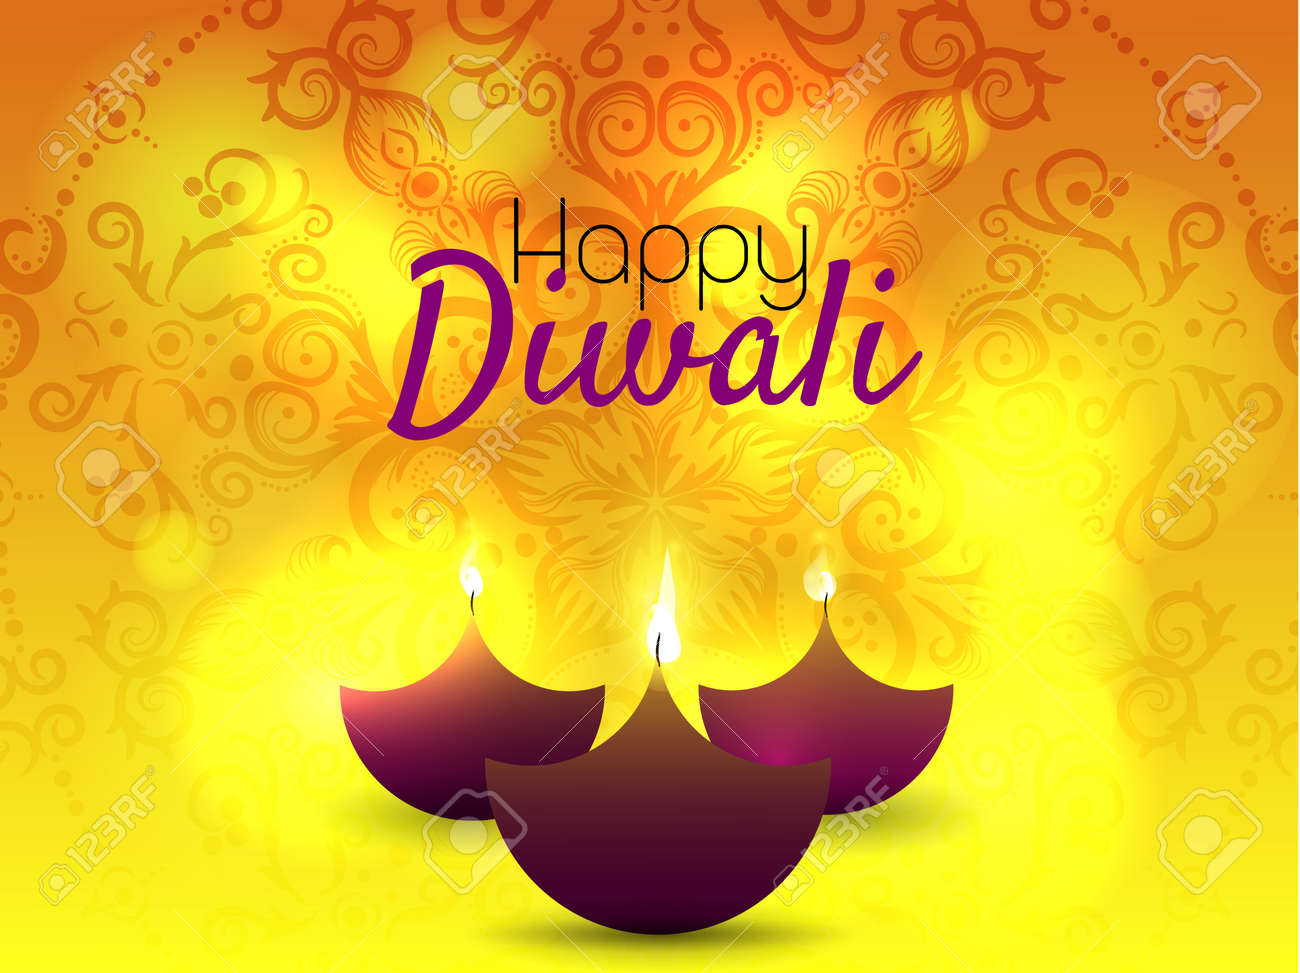 Beautiful greeting card for hindu community festival diwali beautiful greeting card for hindu community festival diwali happy diwali festival background illustration diwali m4hsunfo